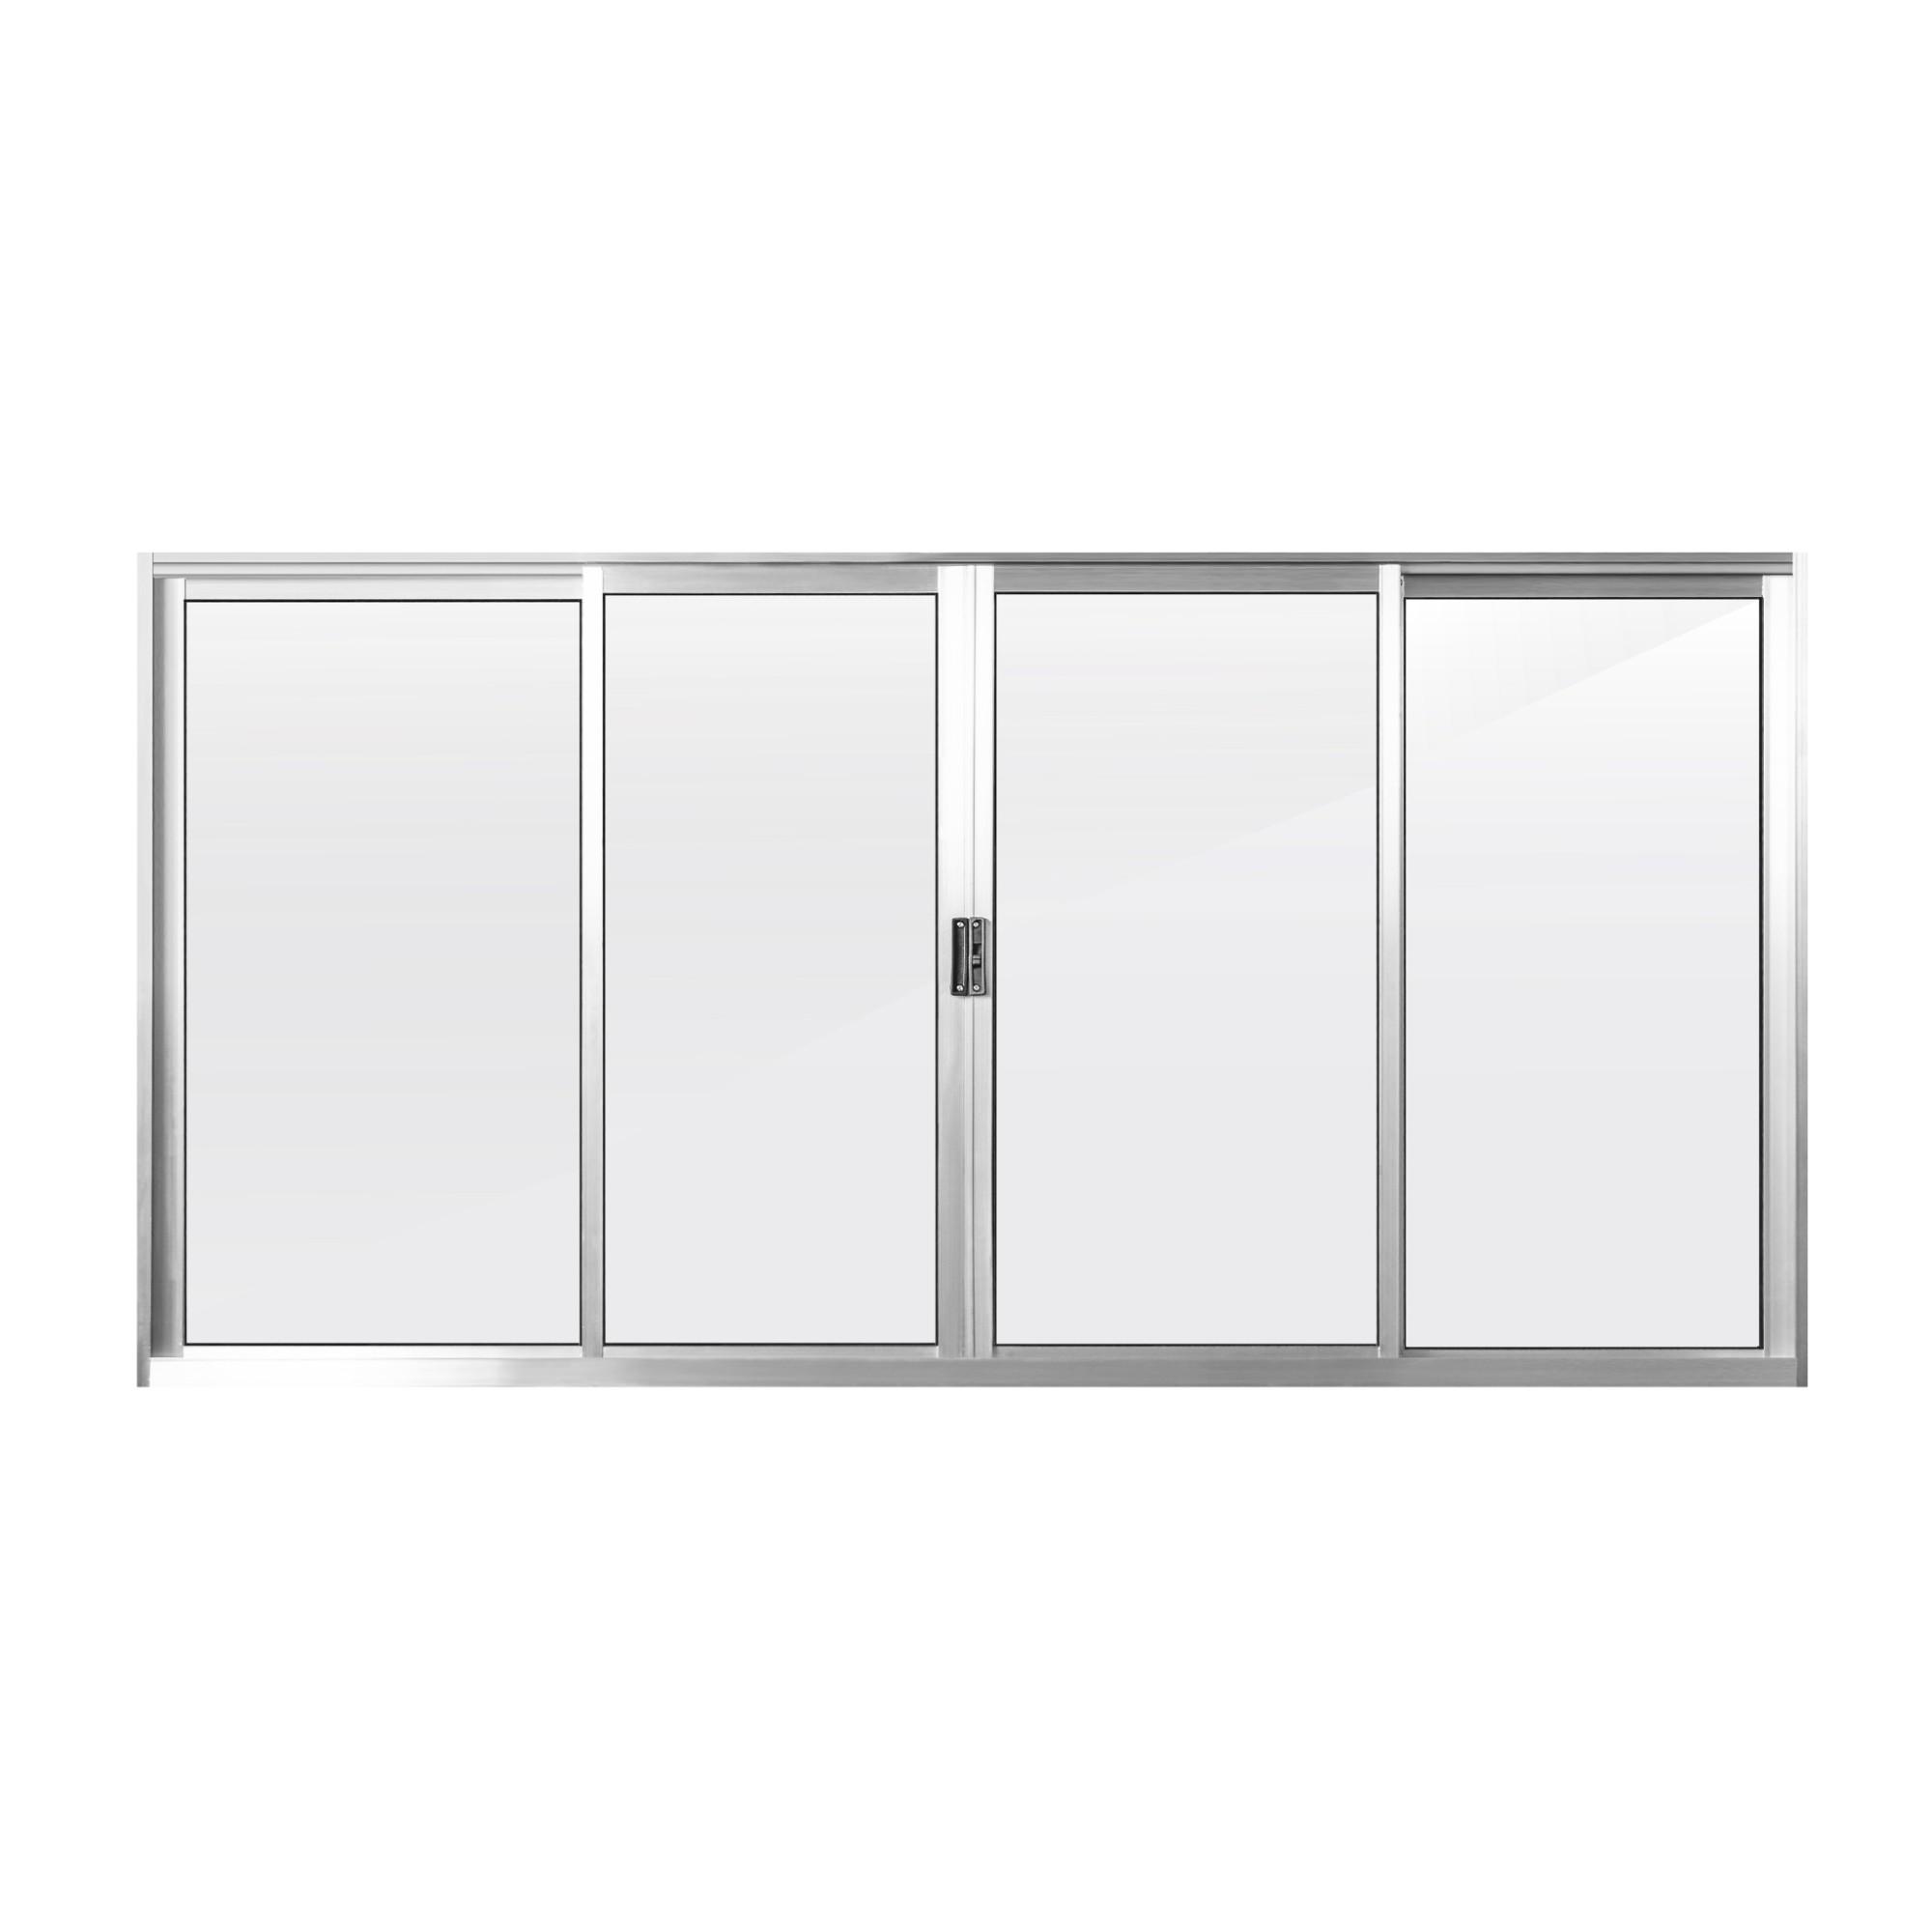 Janela de Correr de Aluminio 4 Folhas 100x200 - 312854 - Aluvid